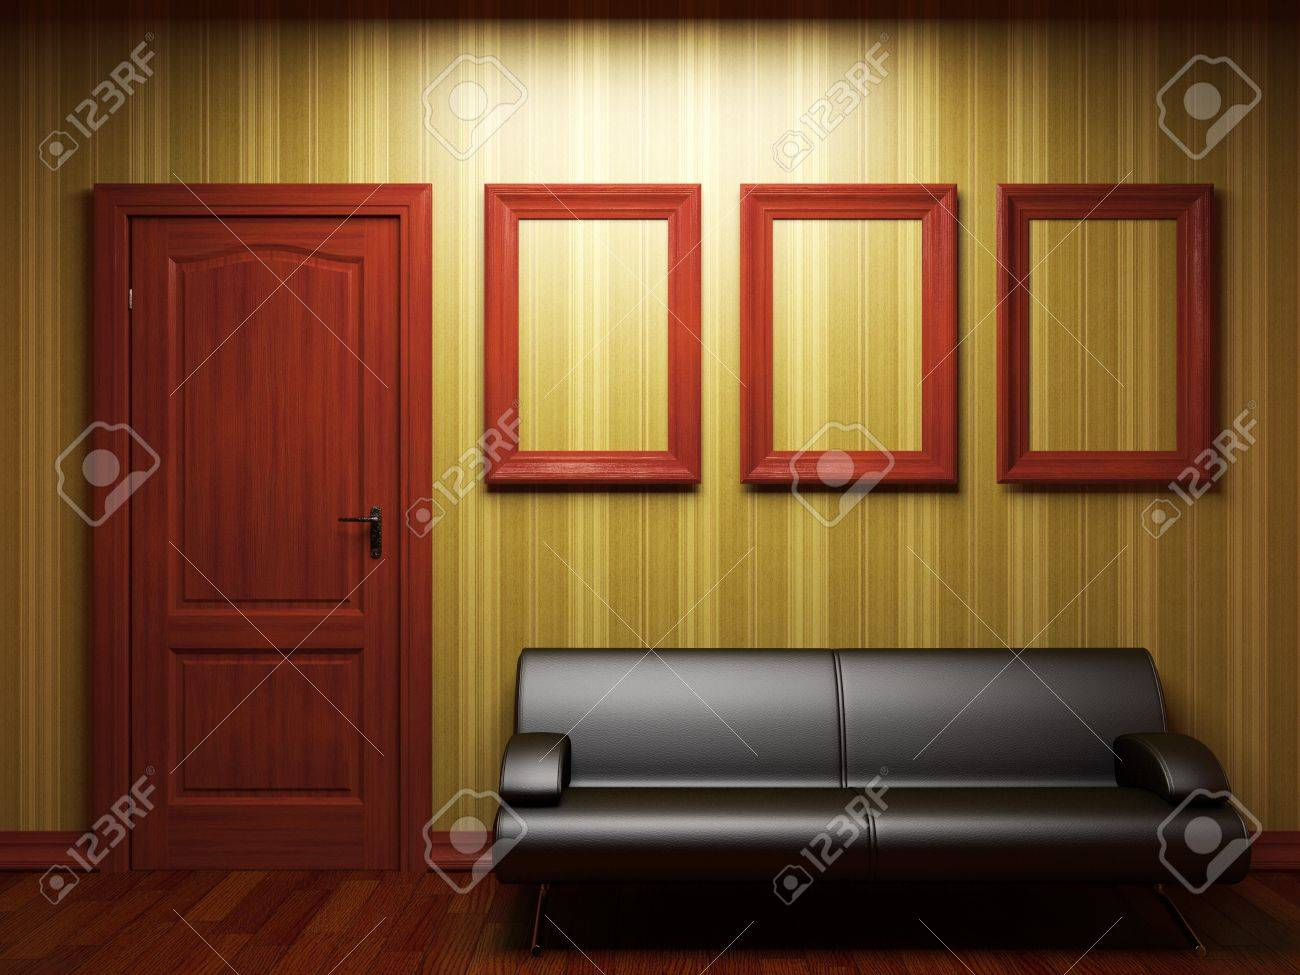 sofa, door and frames Stock Photo - 7068409